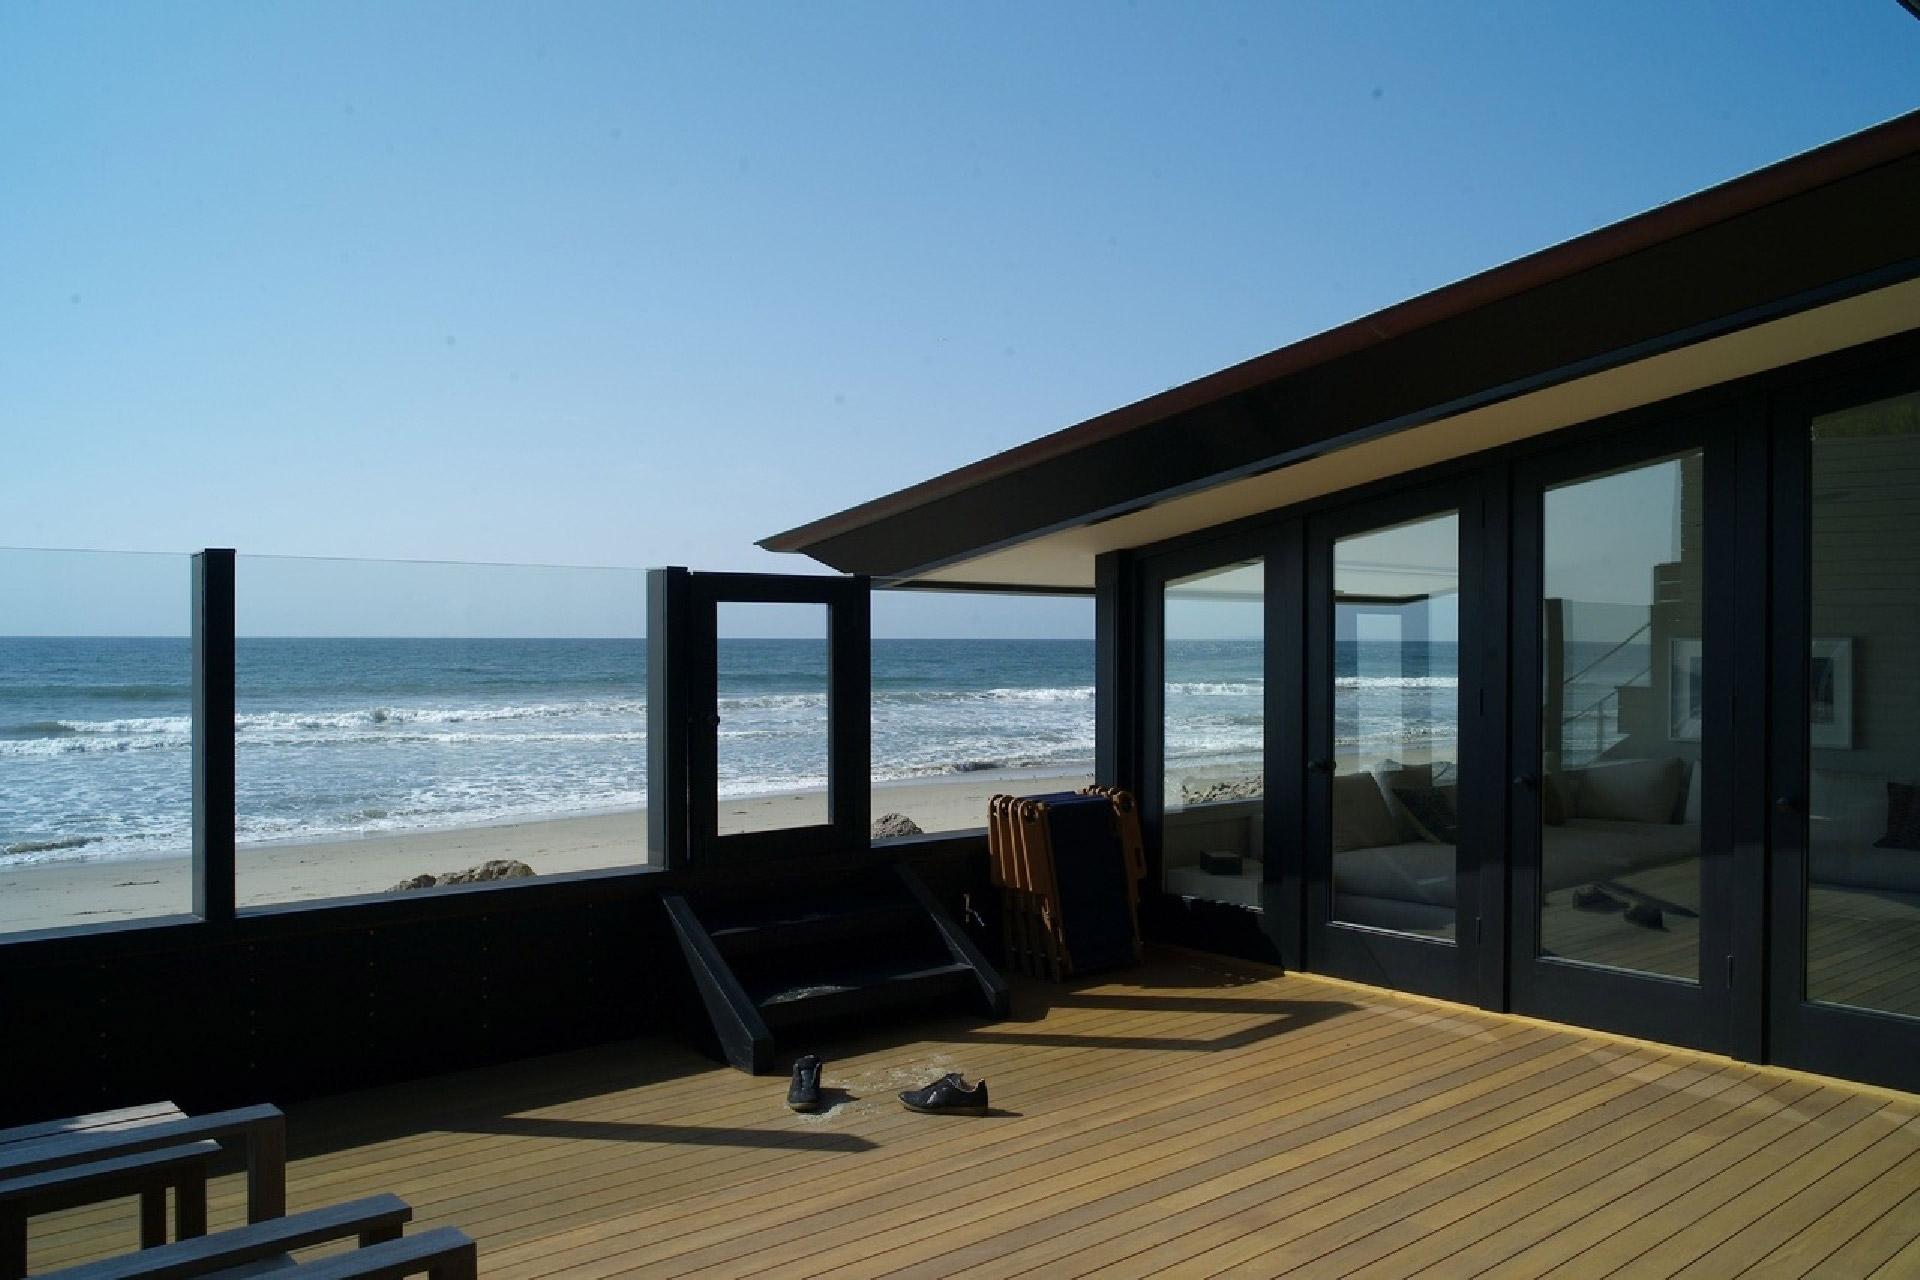 Ein Blick in Jason Stathams Strandhaus in Malibu, Kalifornien 2